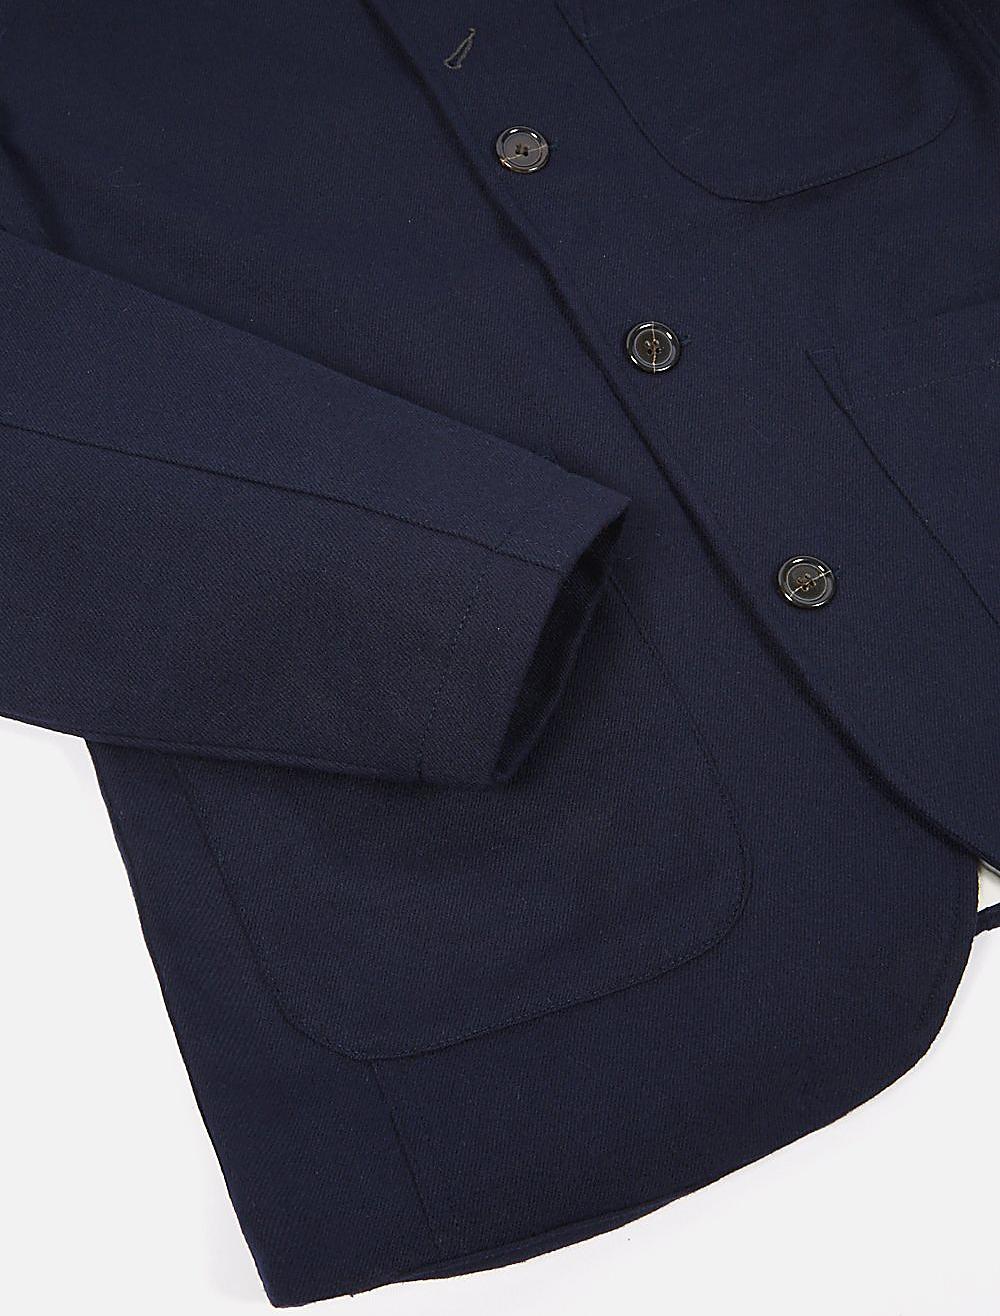 Universal Works Bakers Jacket Twill Wool Navy dettaglio manica